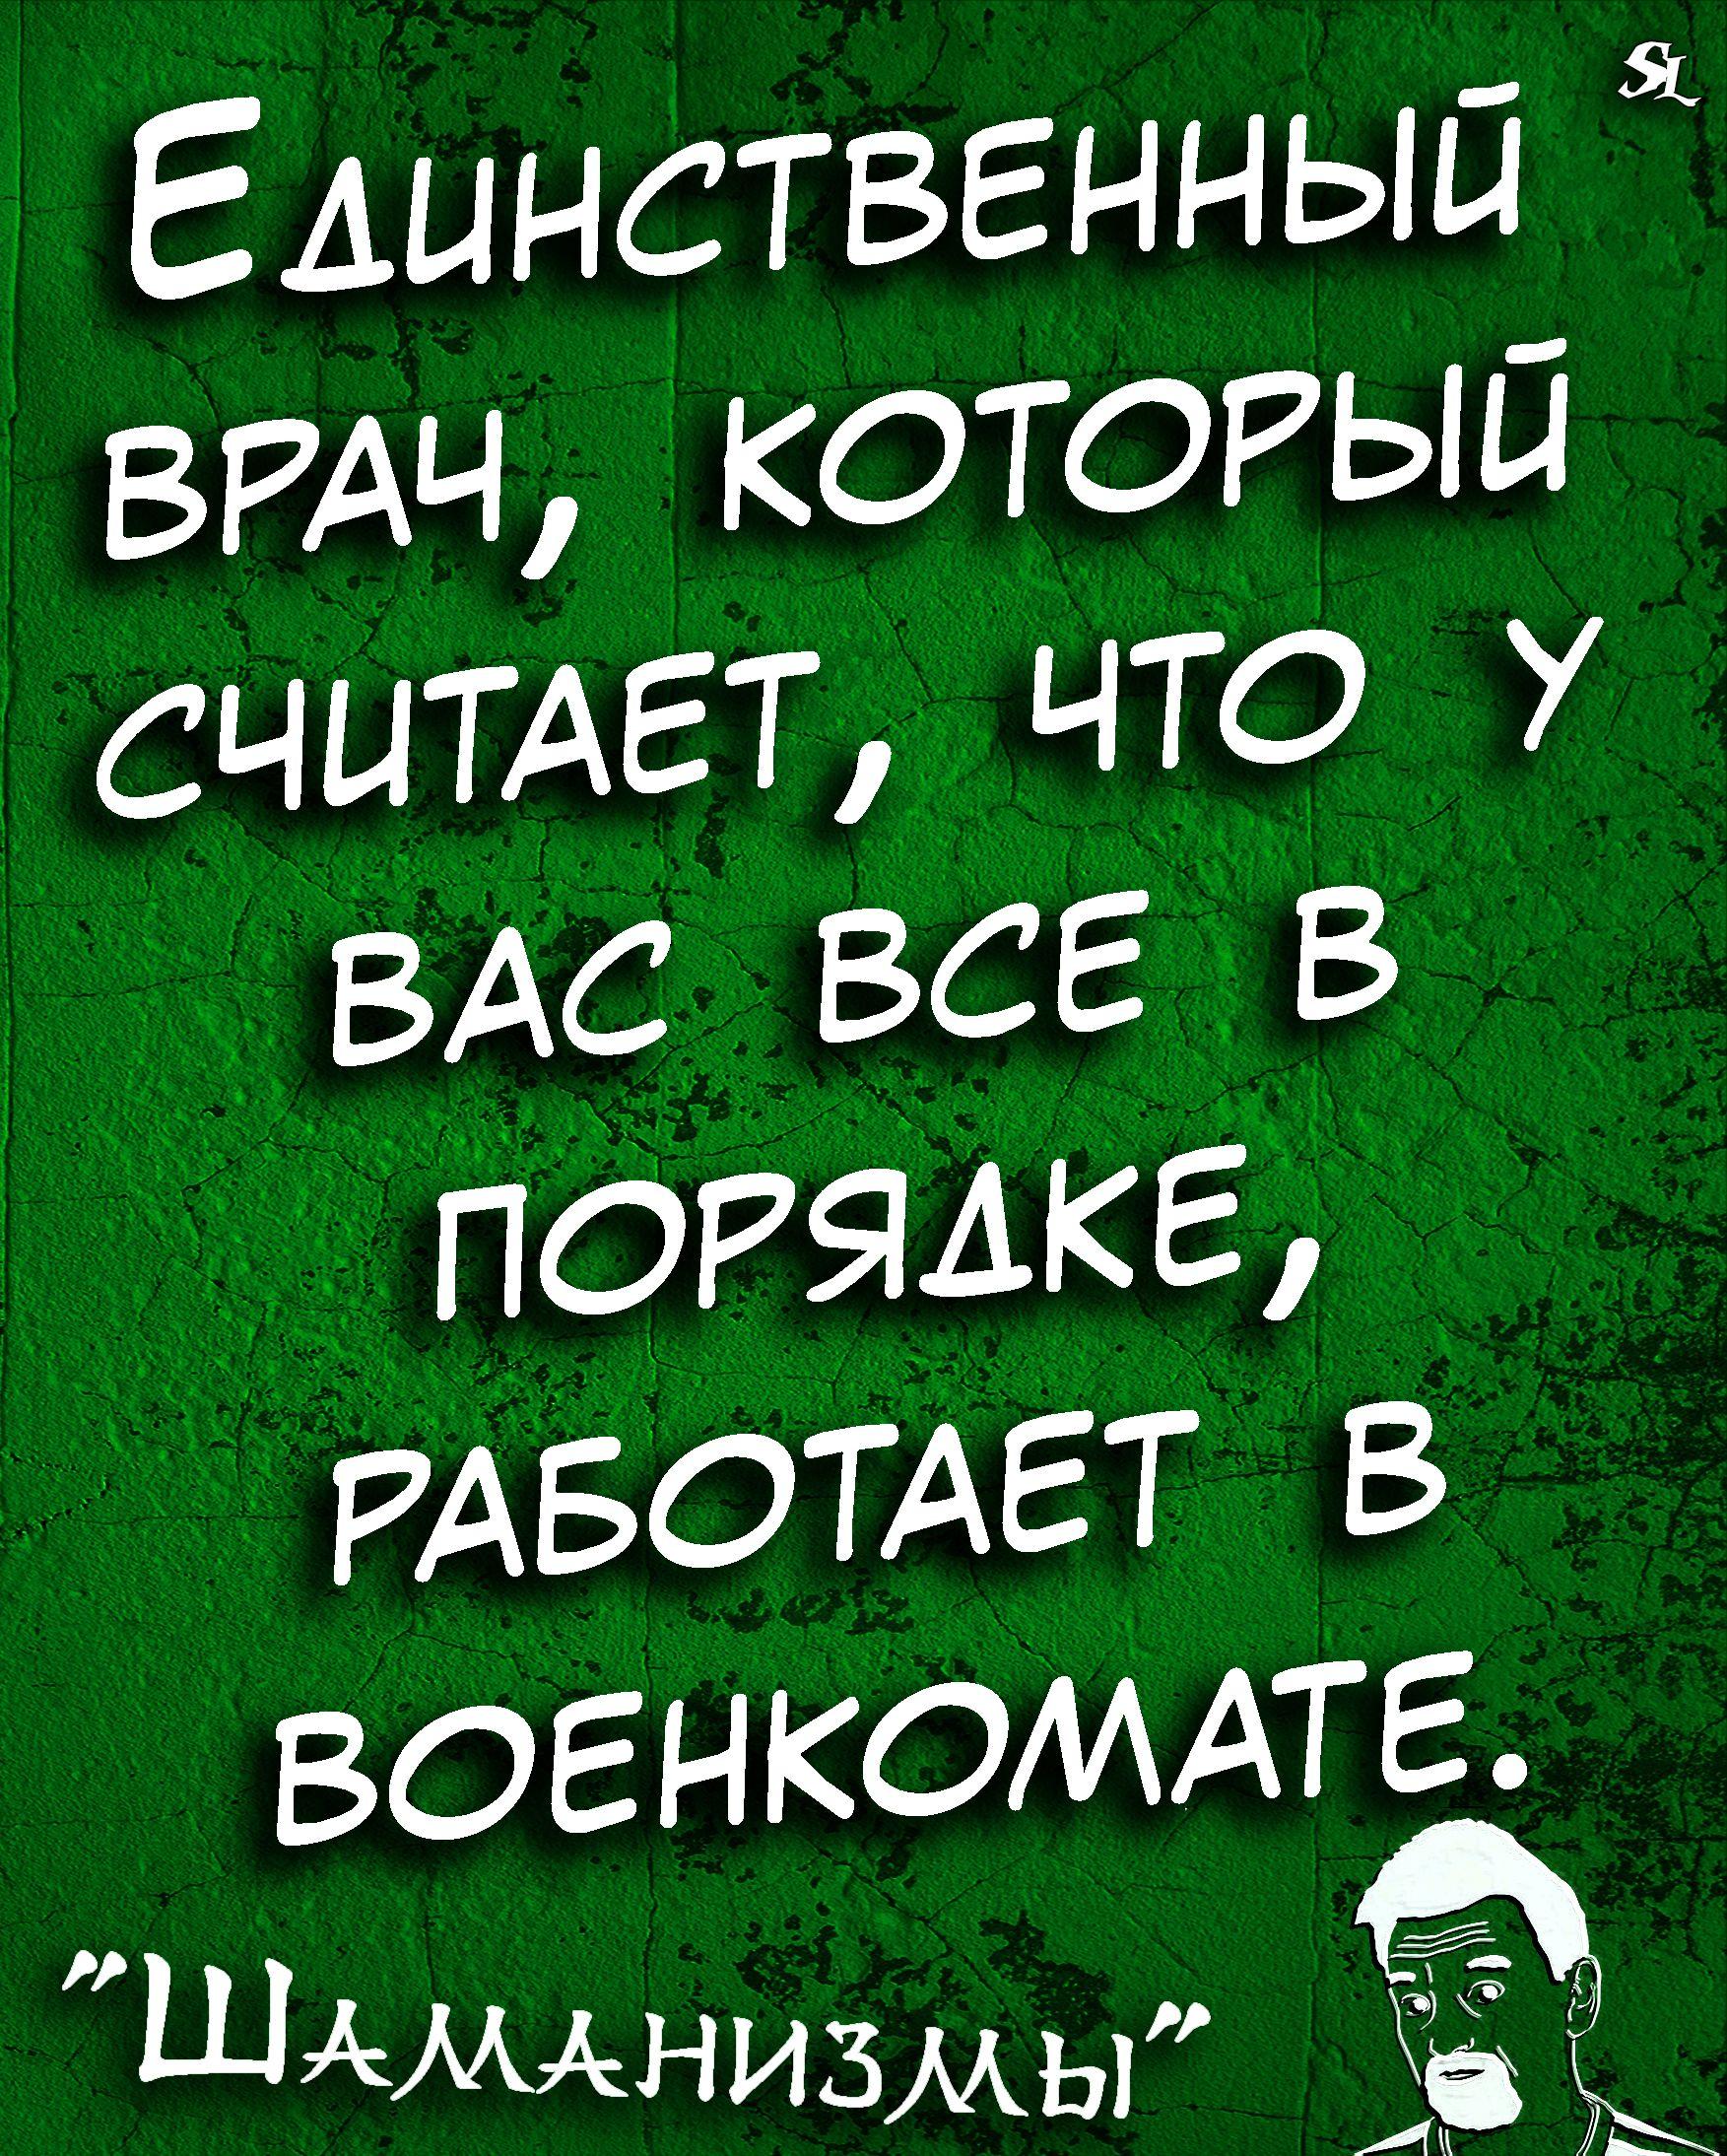 Shamanizmy Shutki Prikol Yumor Jokes Funny Humor Memes Quotations Phrase Of The Day Quotes